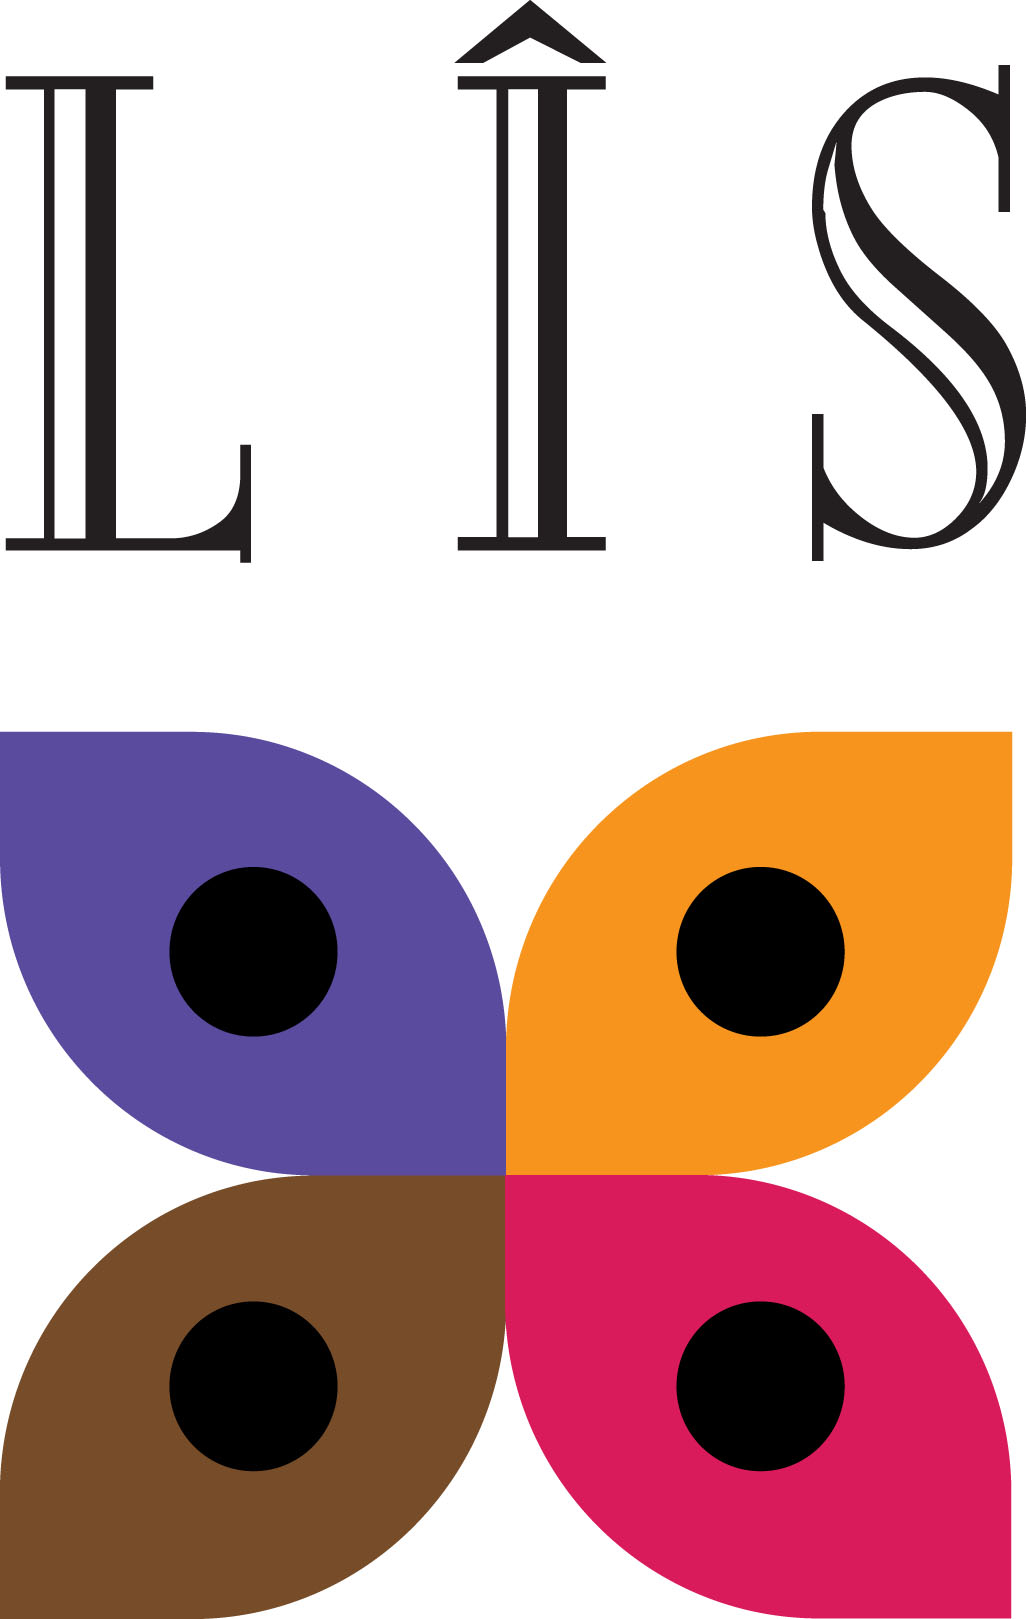 Lis Editions